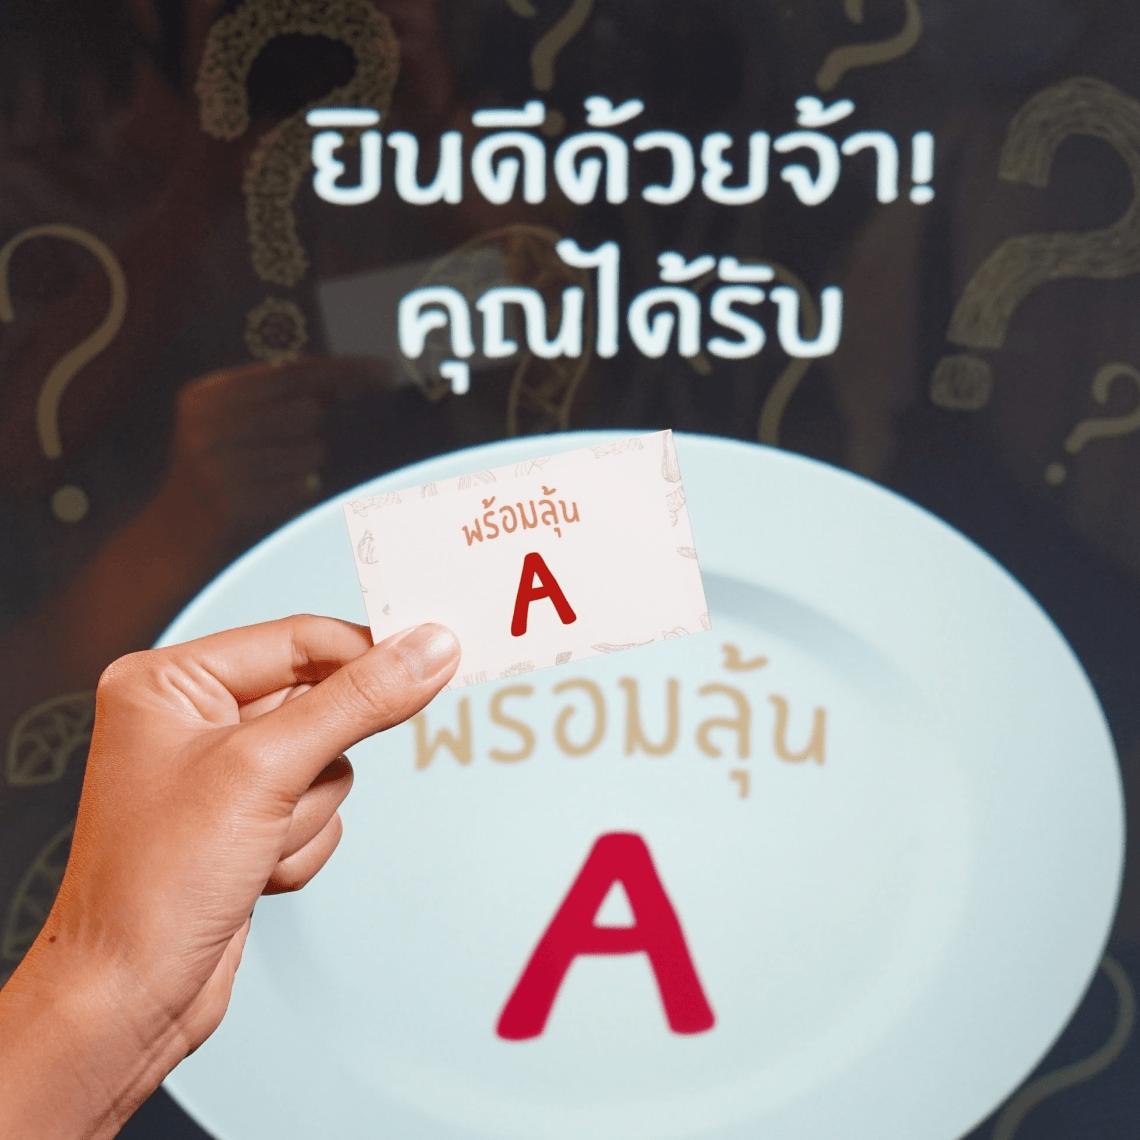 BKK Shop Sells Random Dishes